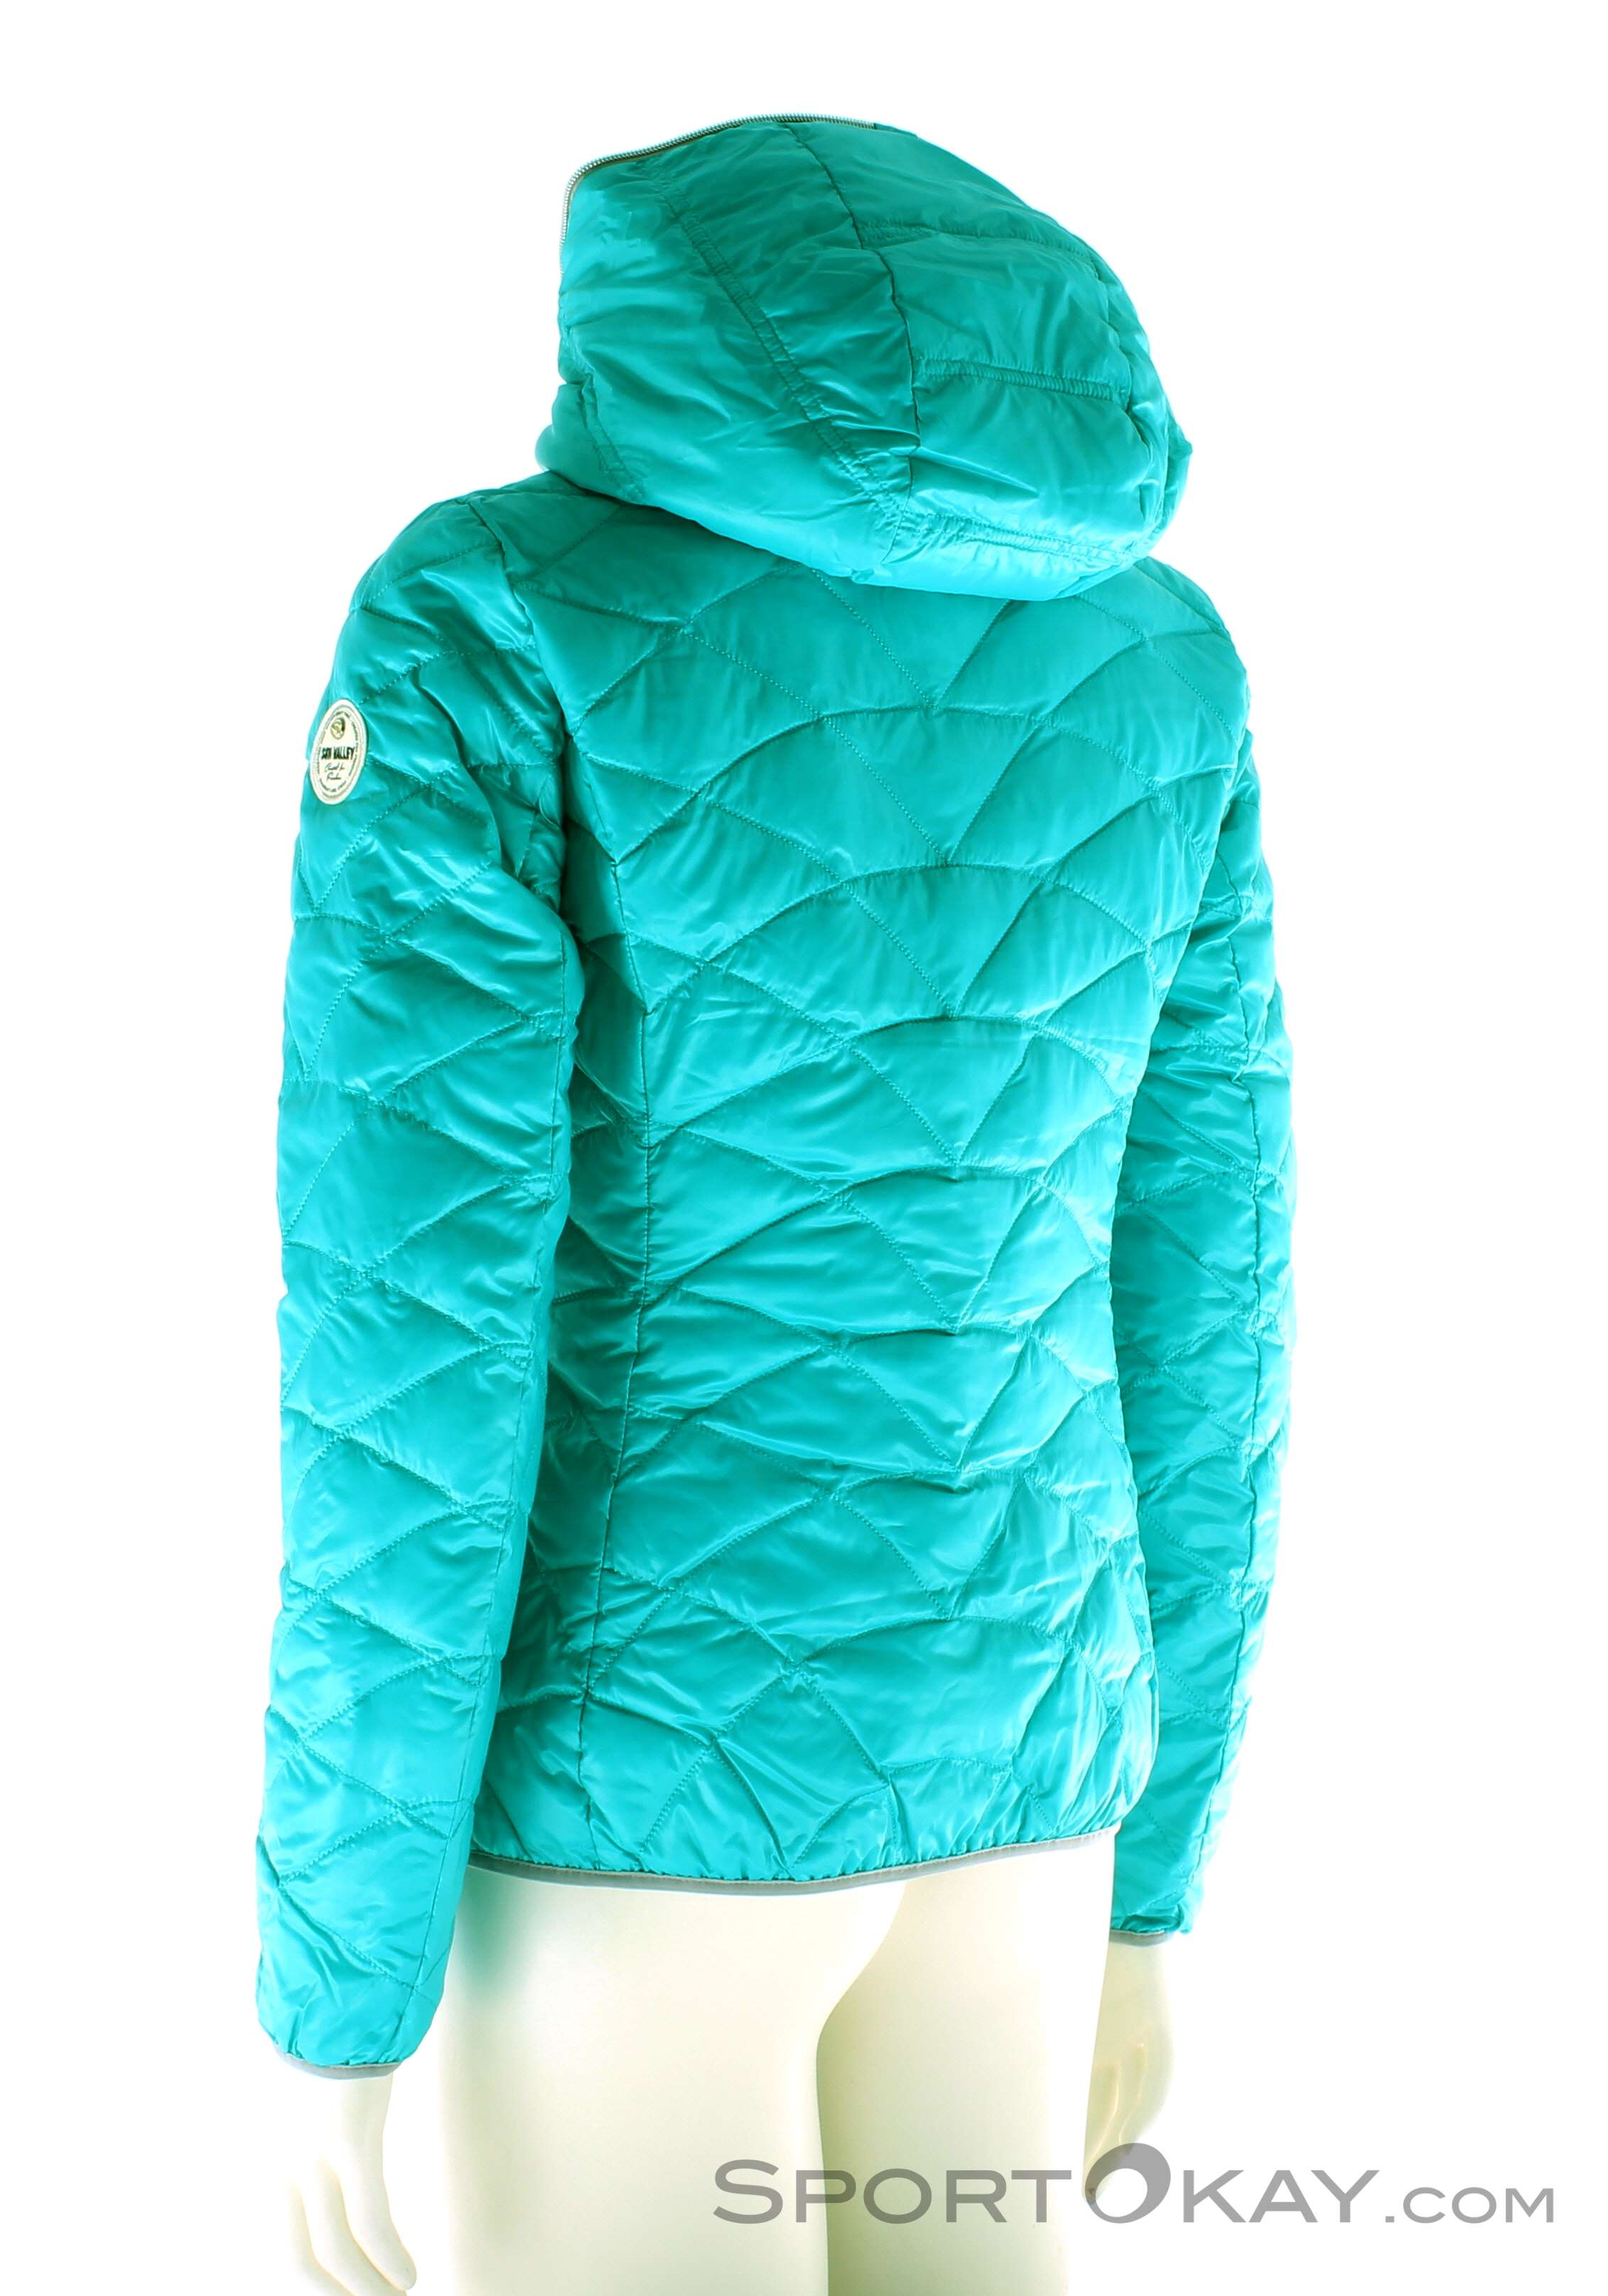 sun valley bizerte womens leisure jacket jackets. Black Bedroom Furniture Sets. Home Design Ideas